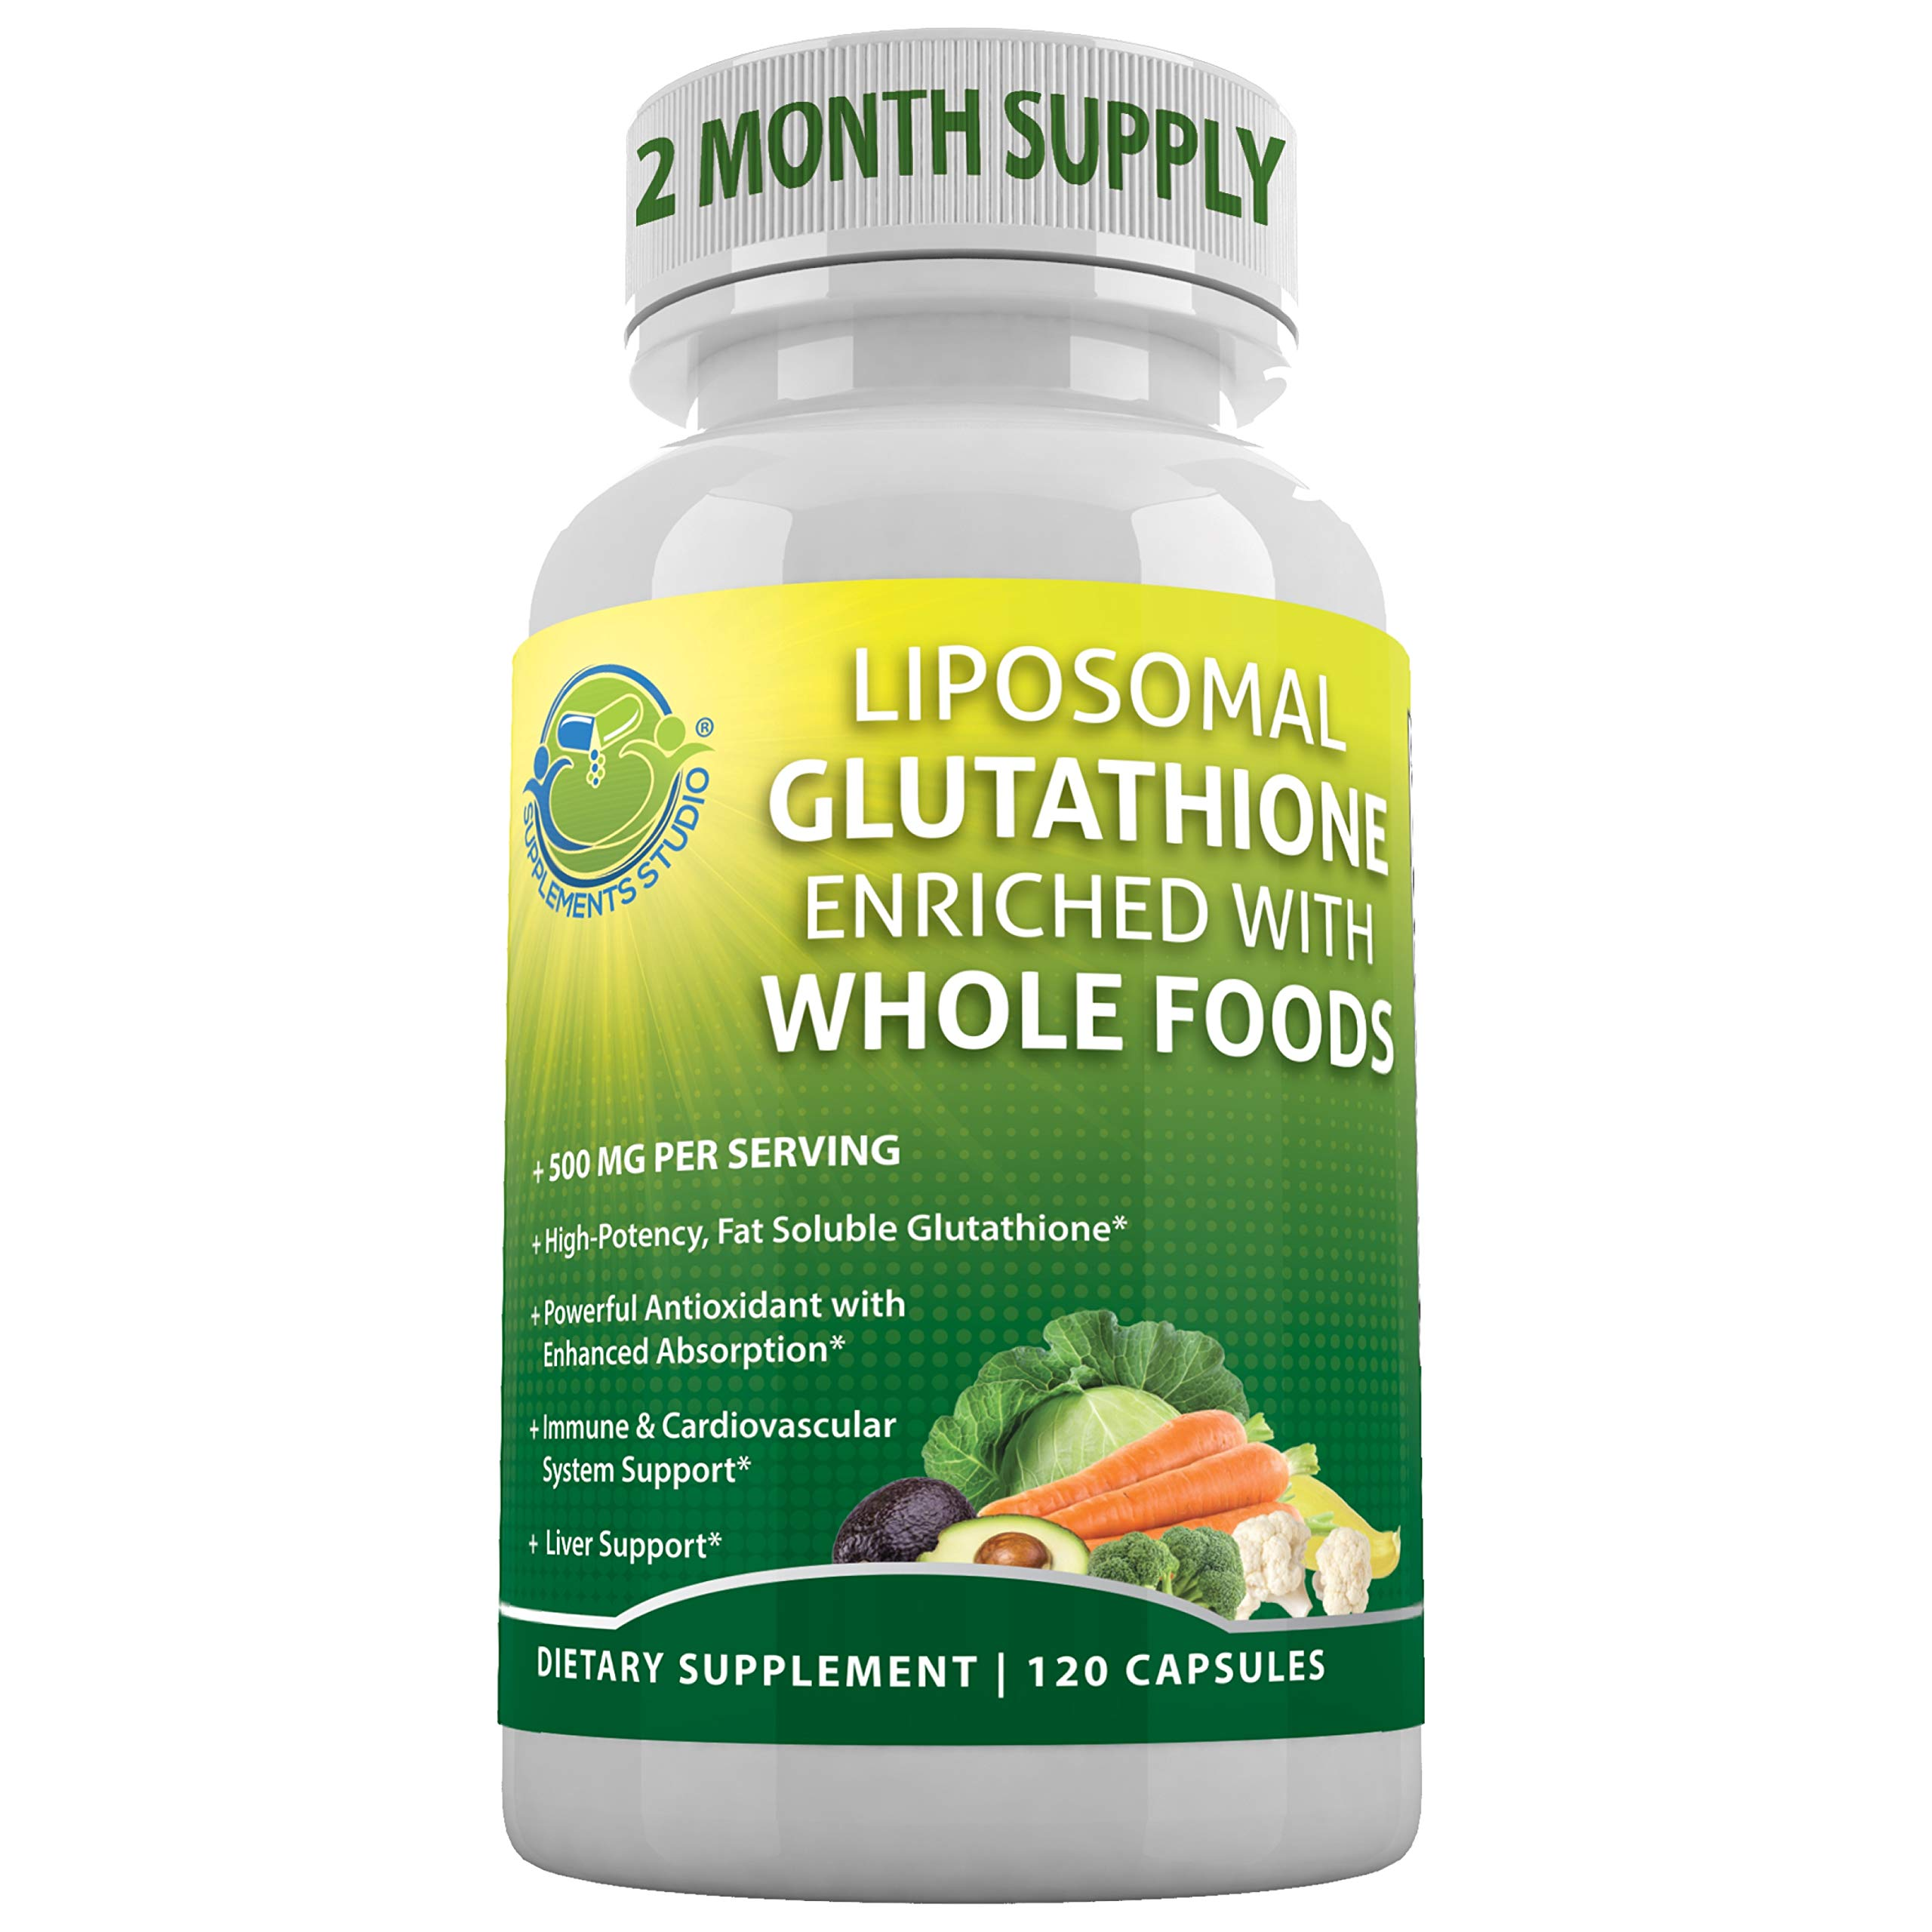 Supplements Studio Liposomal Glutathione 500mg, with Whole Foods, Master Antioxidant, Immune & Cardiovascular System Support, Brain Function, Liver Detox, Vegan, Gluten-Free, Non-GMO, 120 Capsules